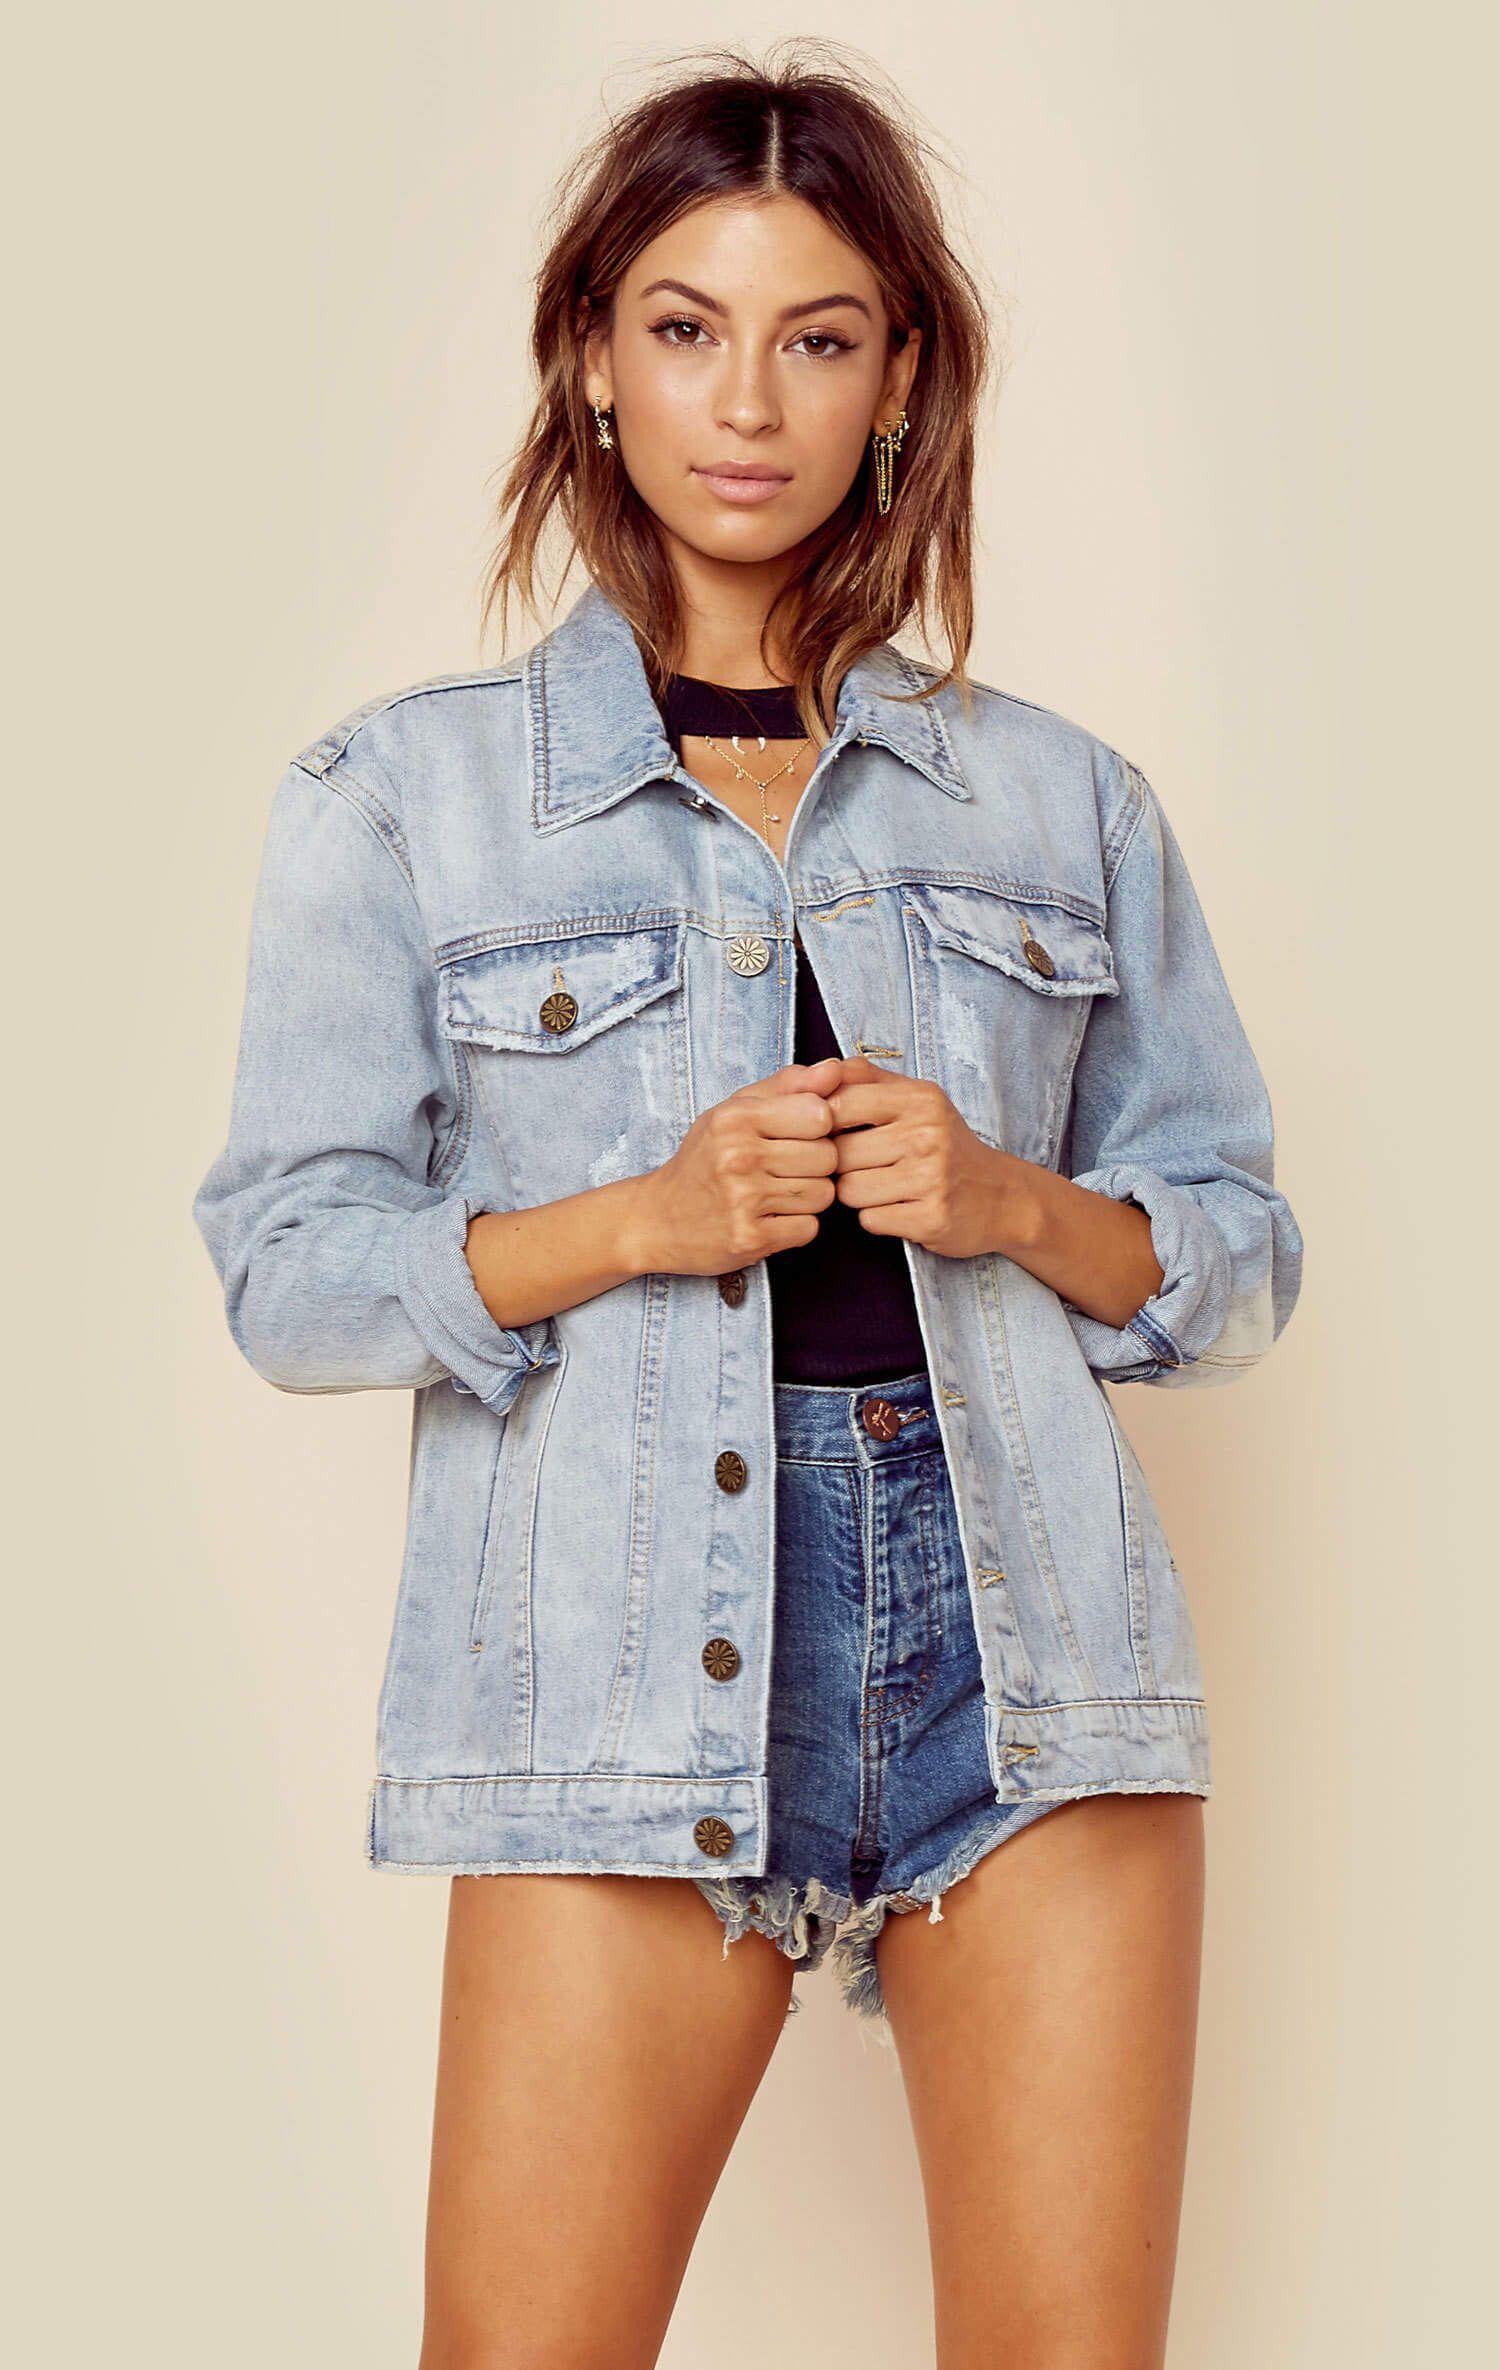 Drine denim jacket california girl style denim jackets and mini